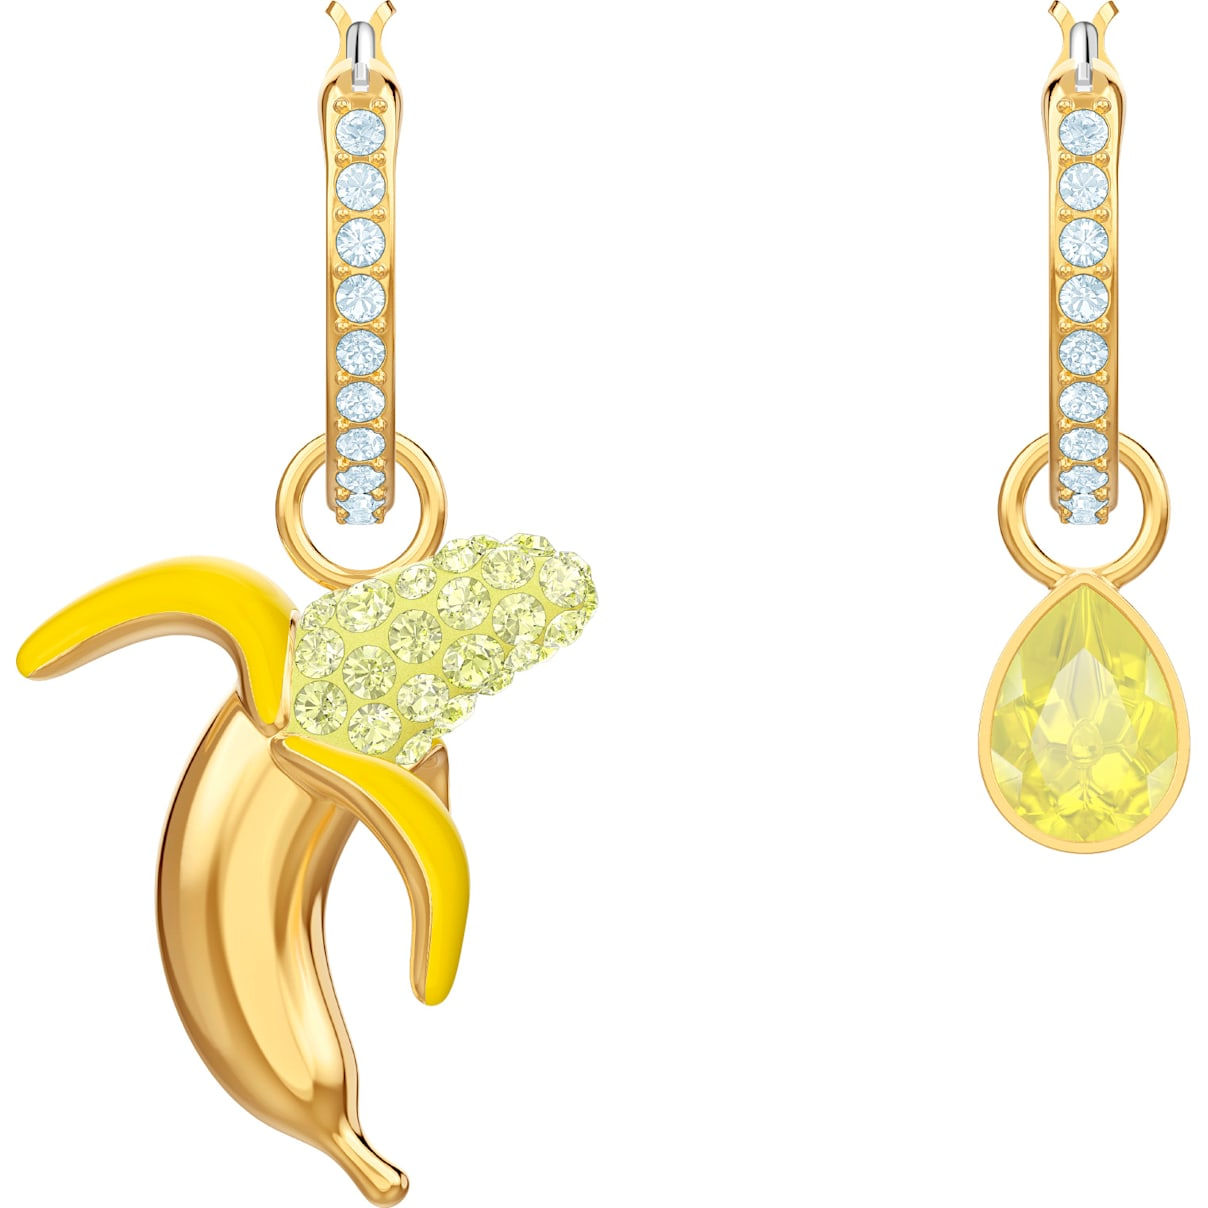 Swarovski No Regrets Banana Pierced Earrings, Multi-colored, Gold-tone plated